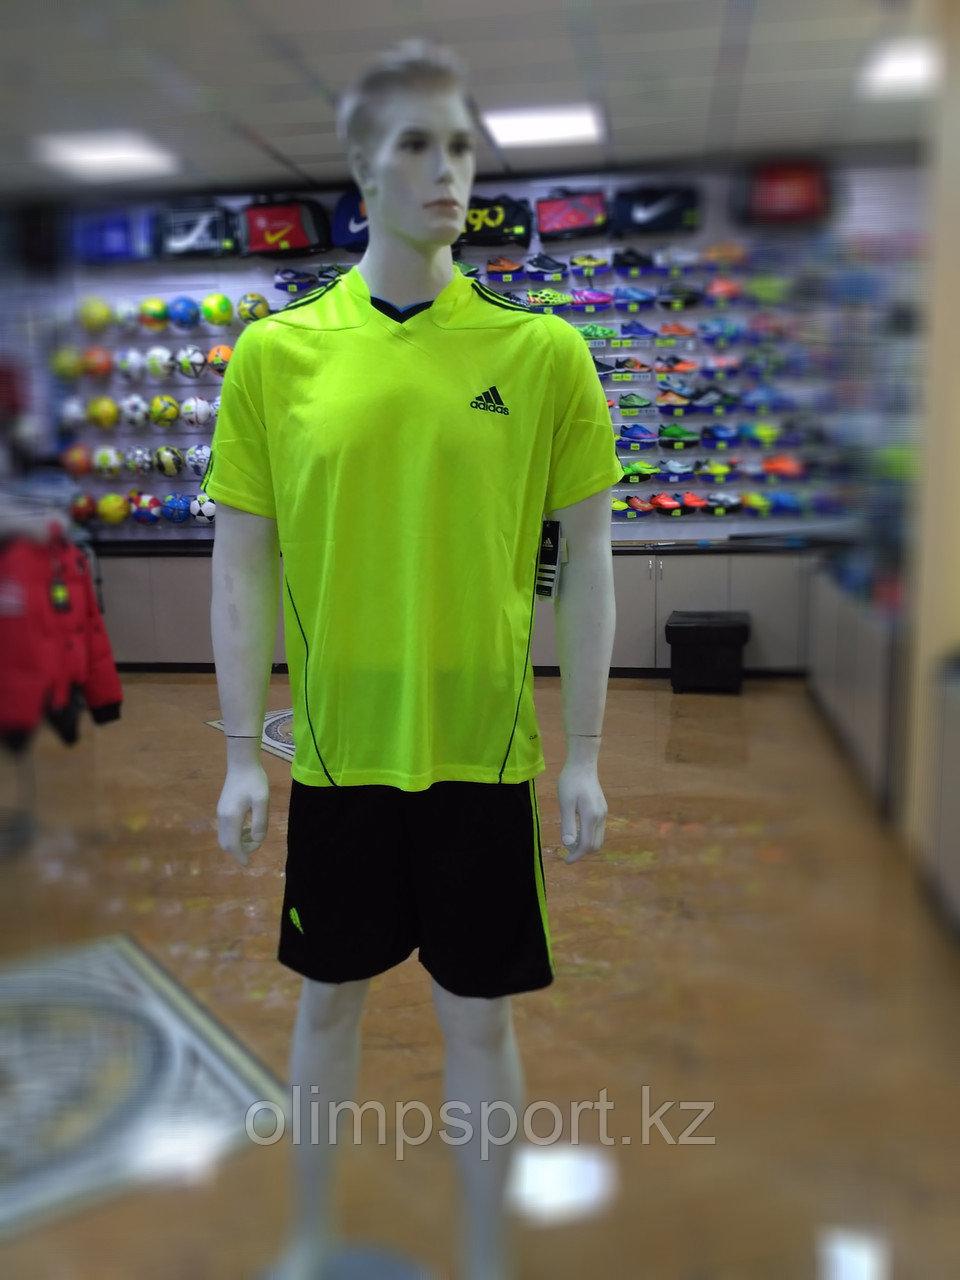 Футбольная форма Adidas 100, желтая